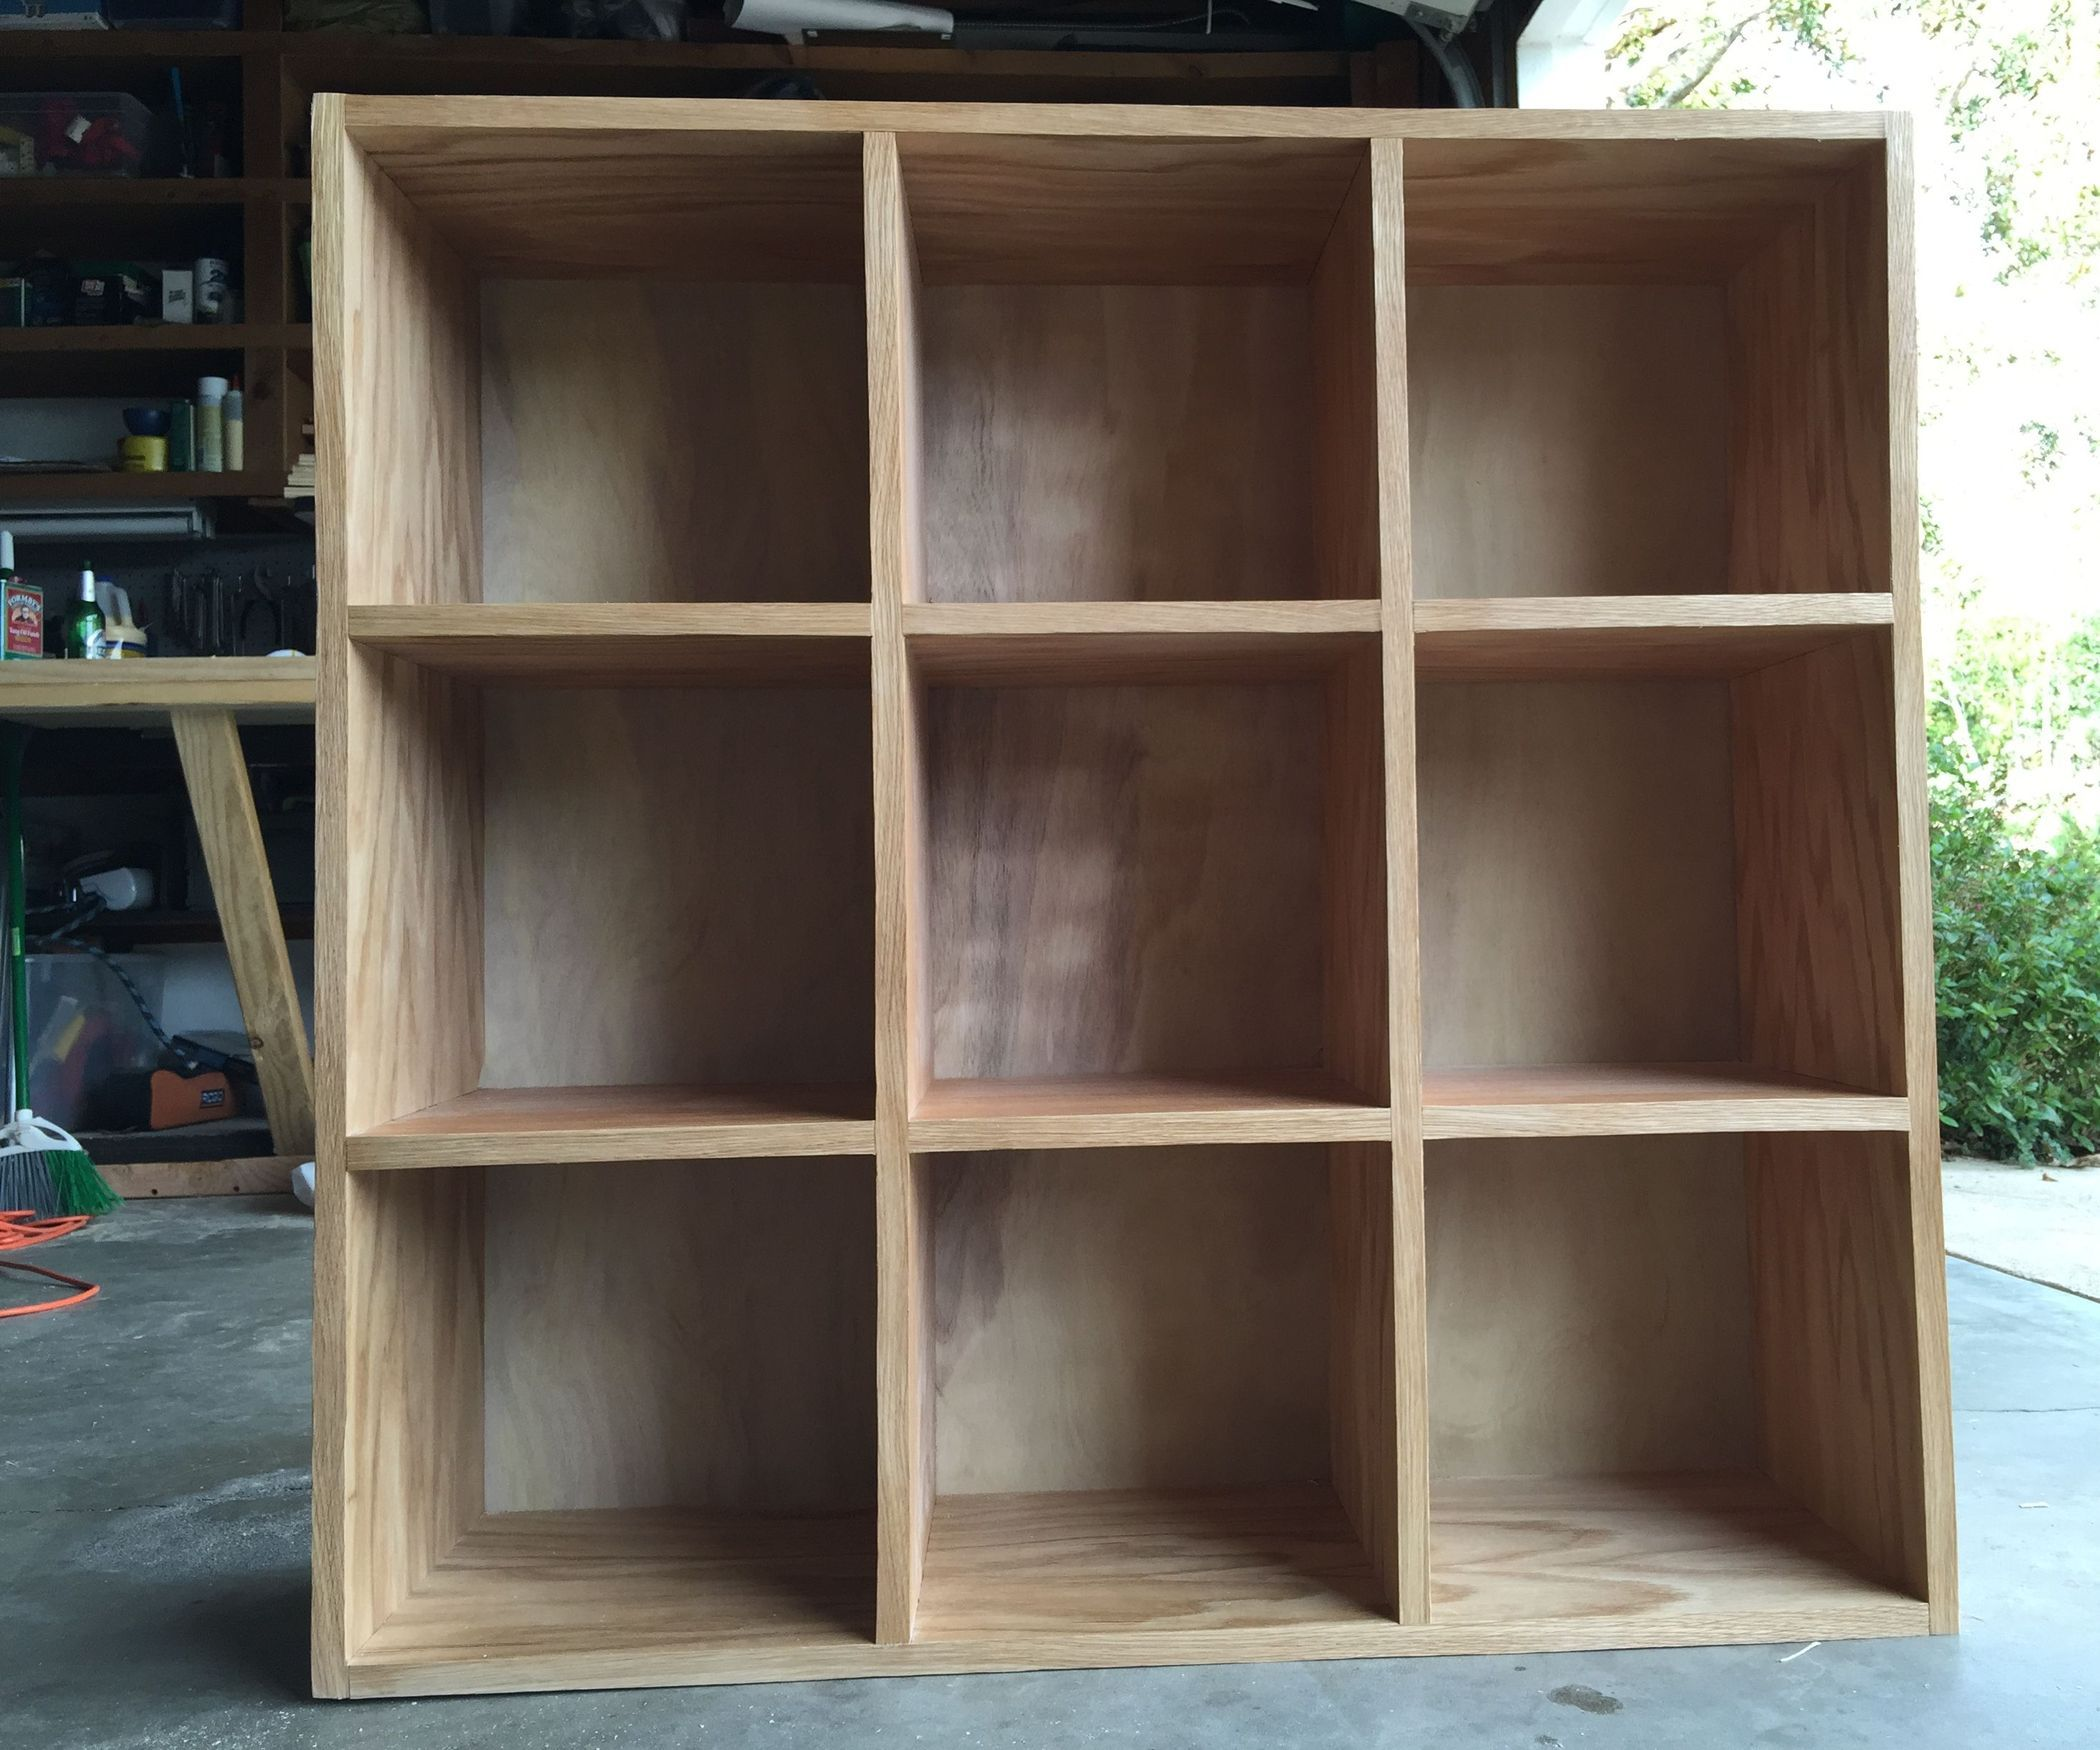 Bookcase Storage Cubby Unit Cubby Storage Diy Cube Storage Storage Bins Diy